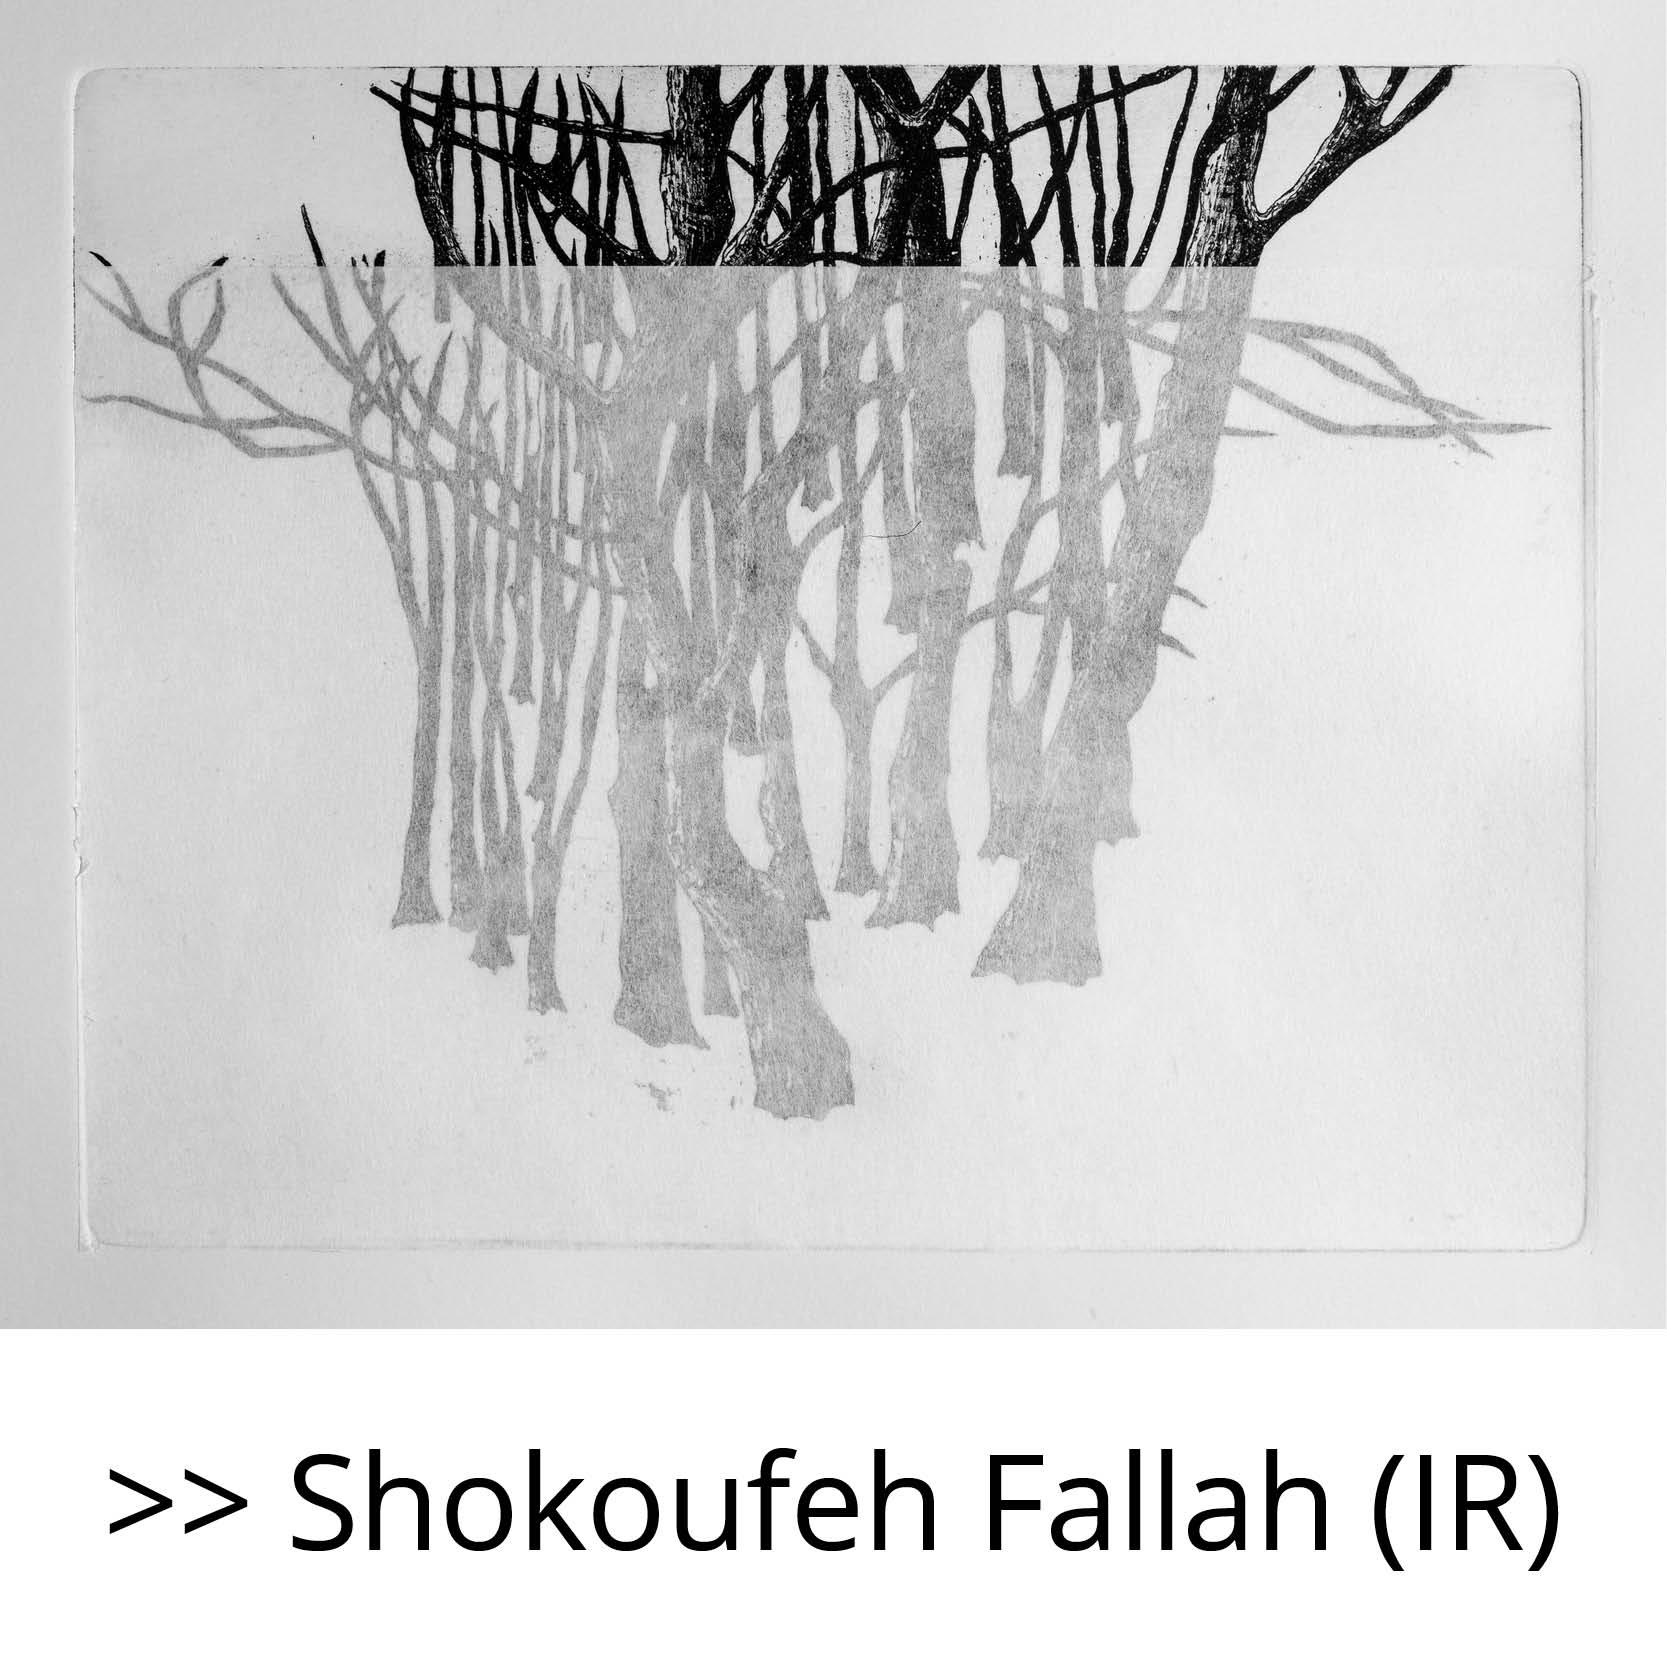 Shokoufeh_Fallah_(IR)